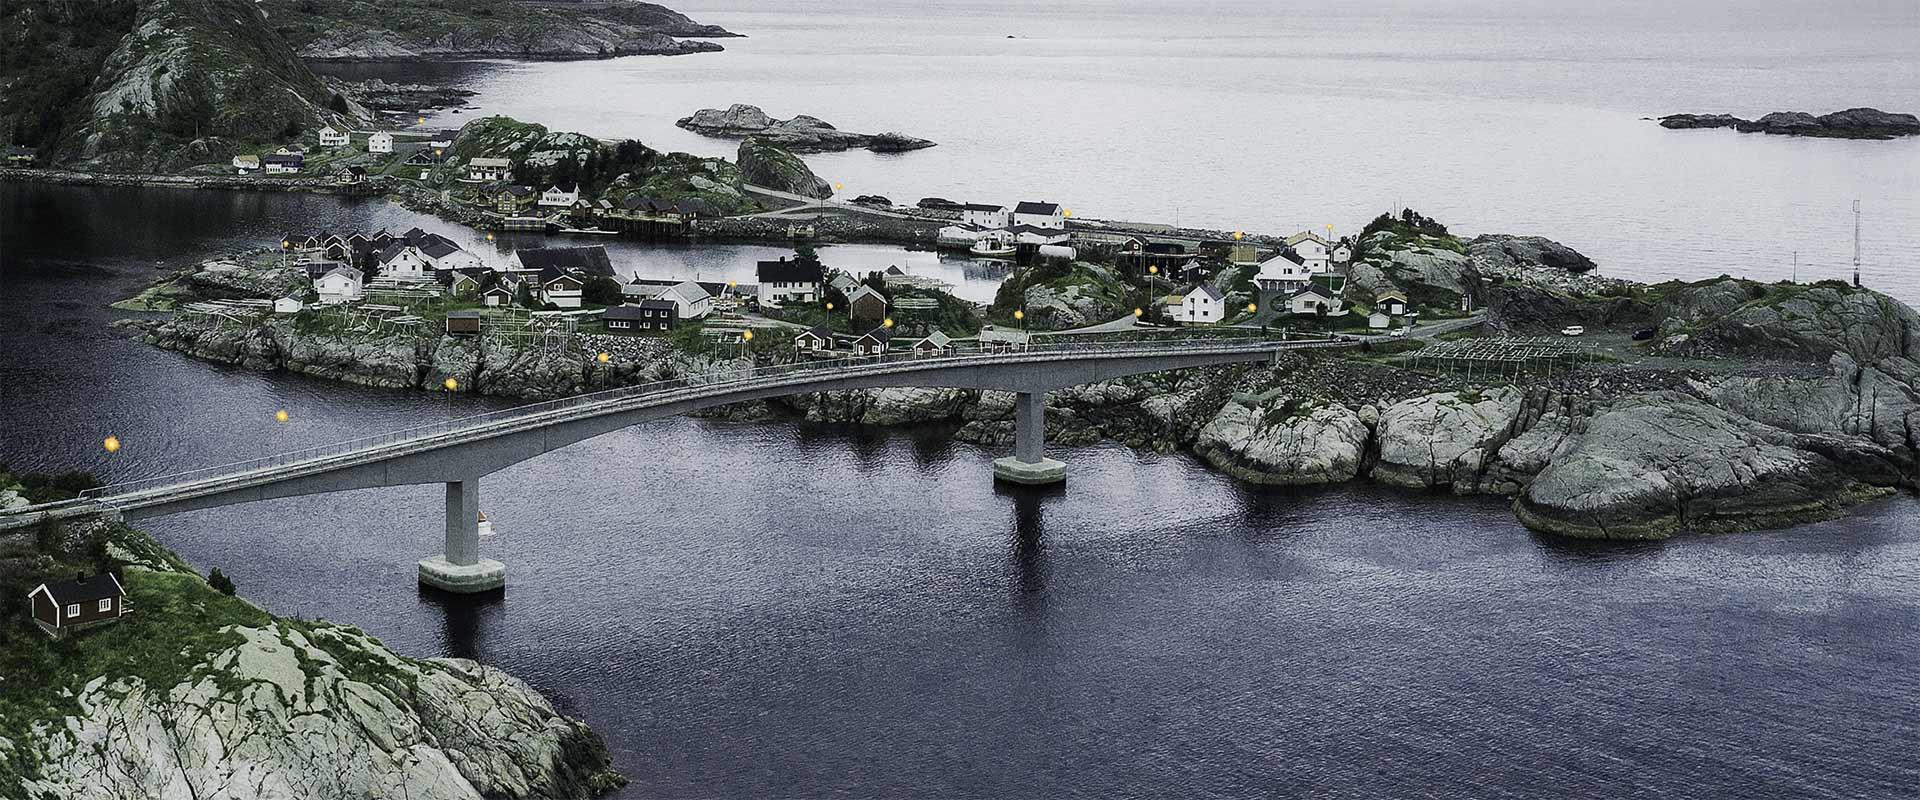 VannAvløp.jpg